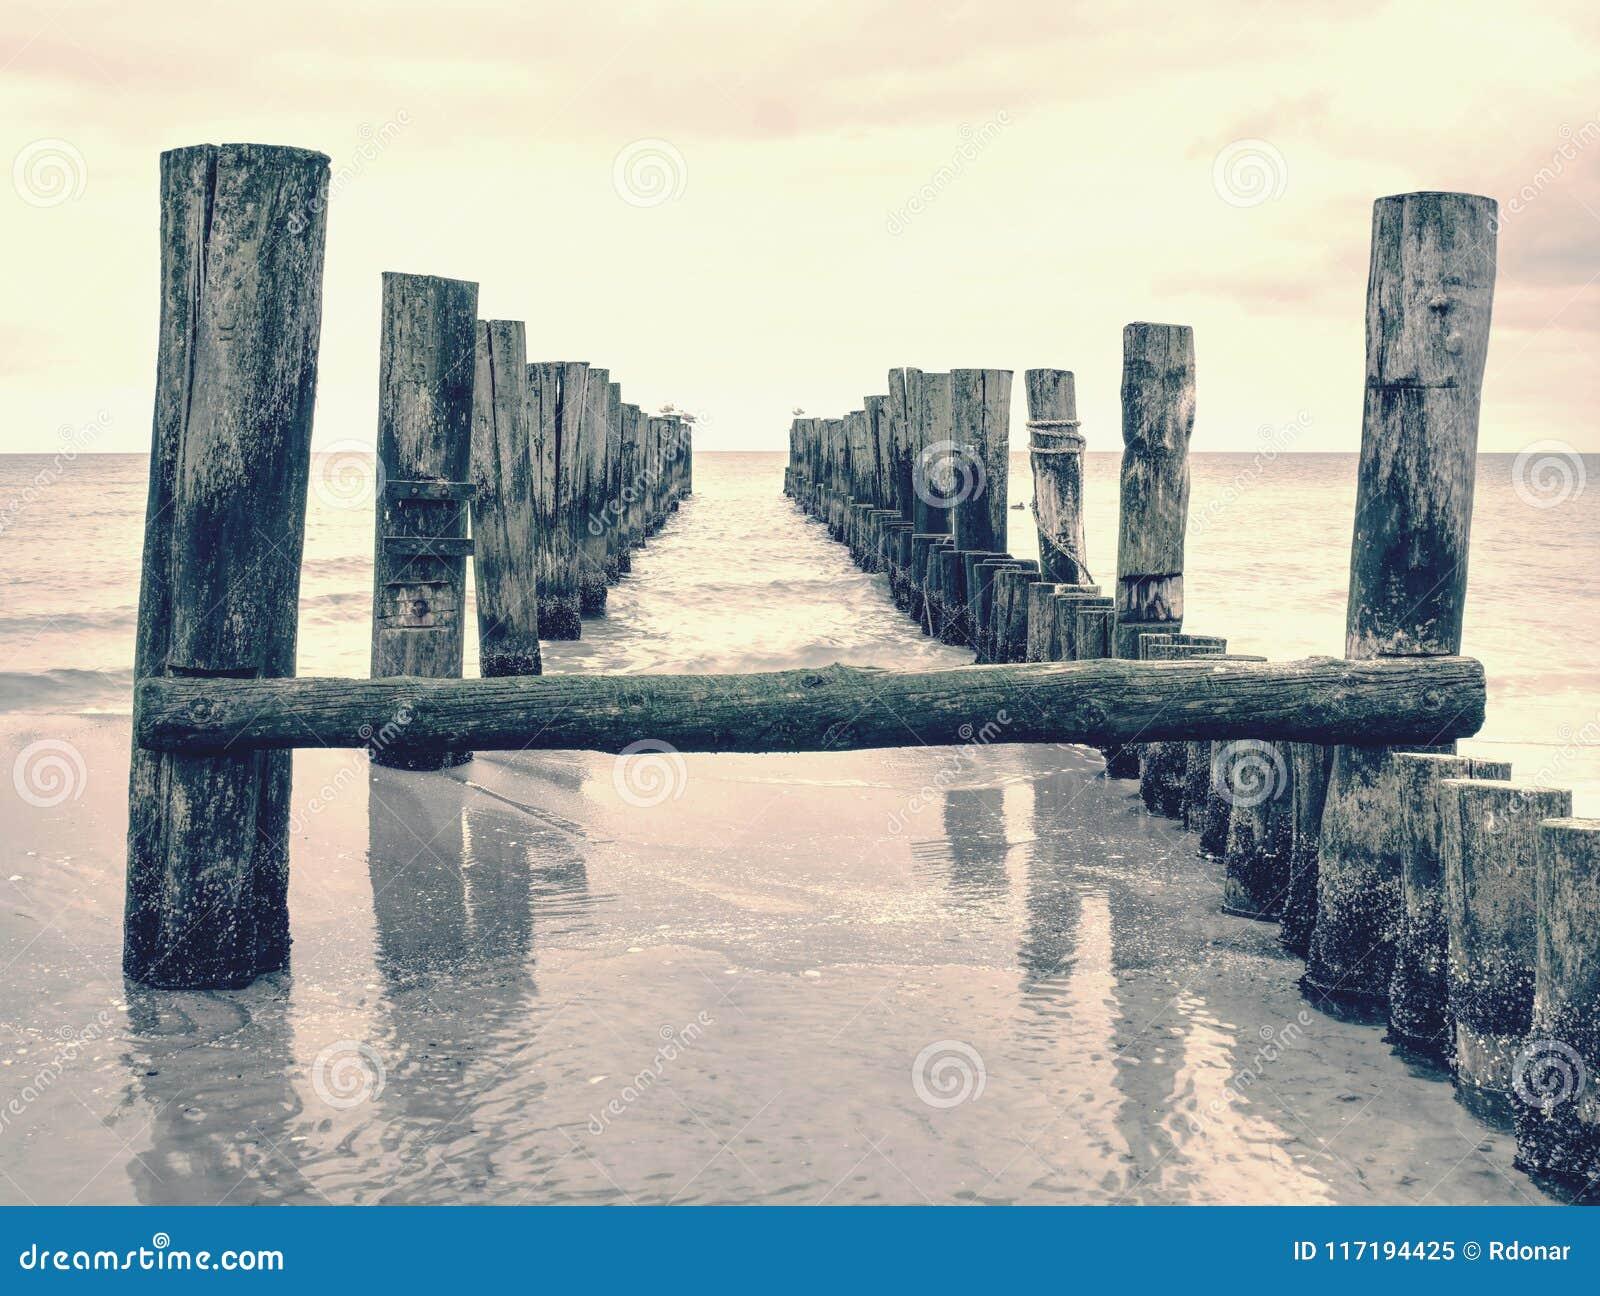 Wooden batten bridge juts out into expanse of sea. The famous tourist attraction